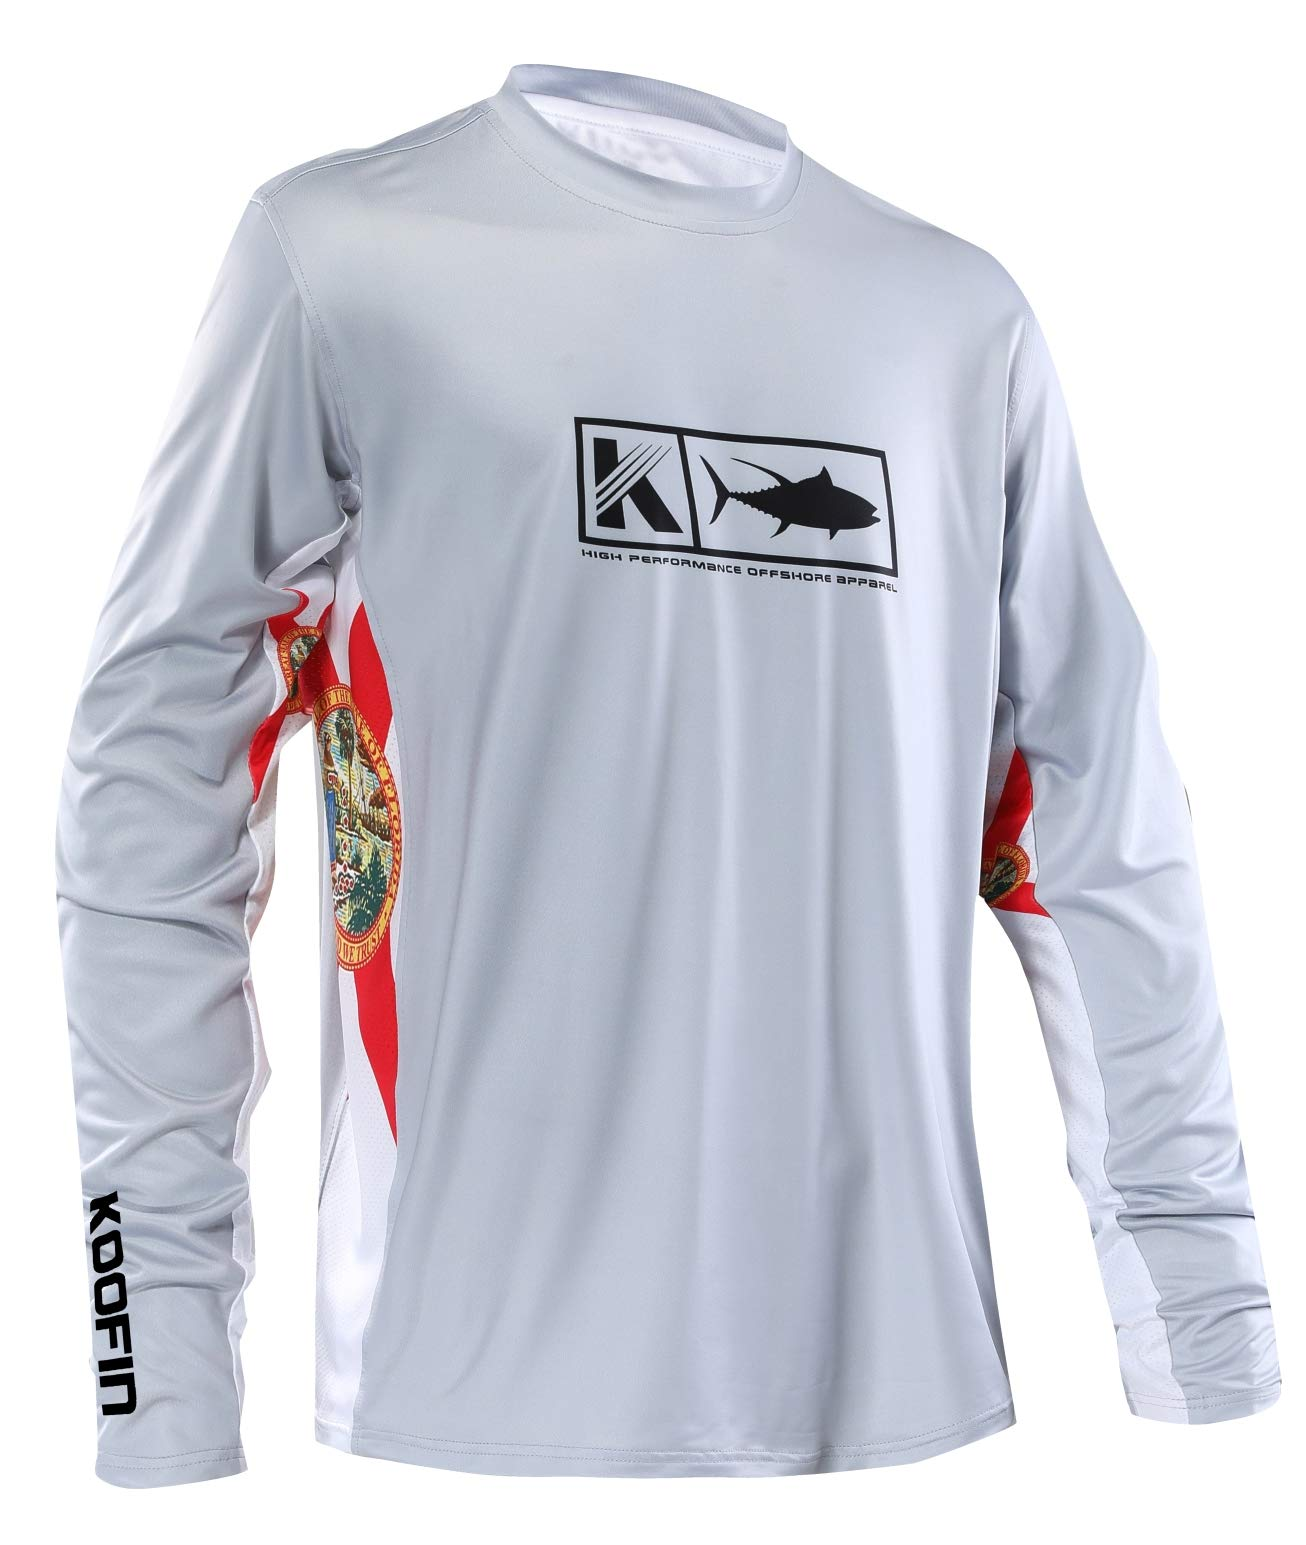 Performance Fishing Shirt Men's Vented Long Sleeve UPF 50 Sun Protection Quick Dry Cooling Side Vents Mesh Rash Guard Grey